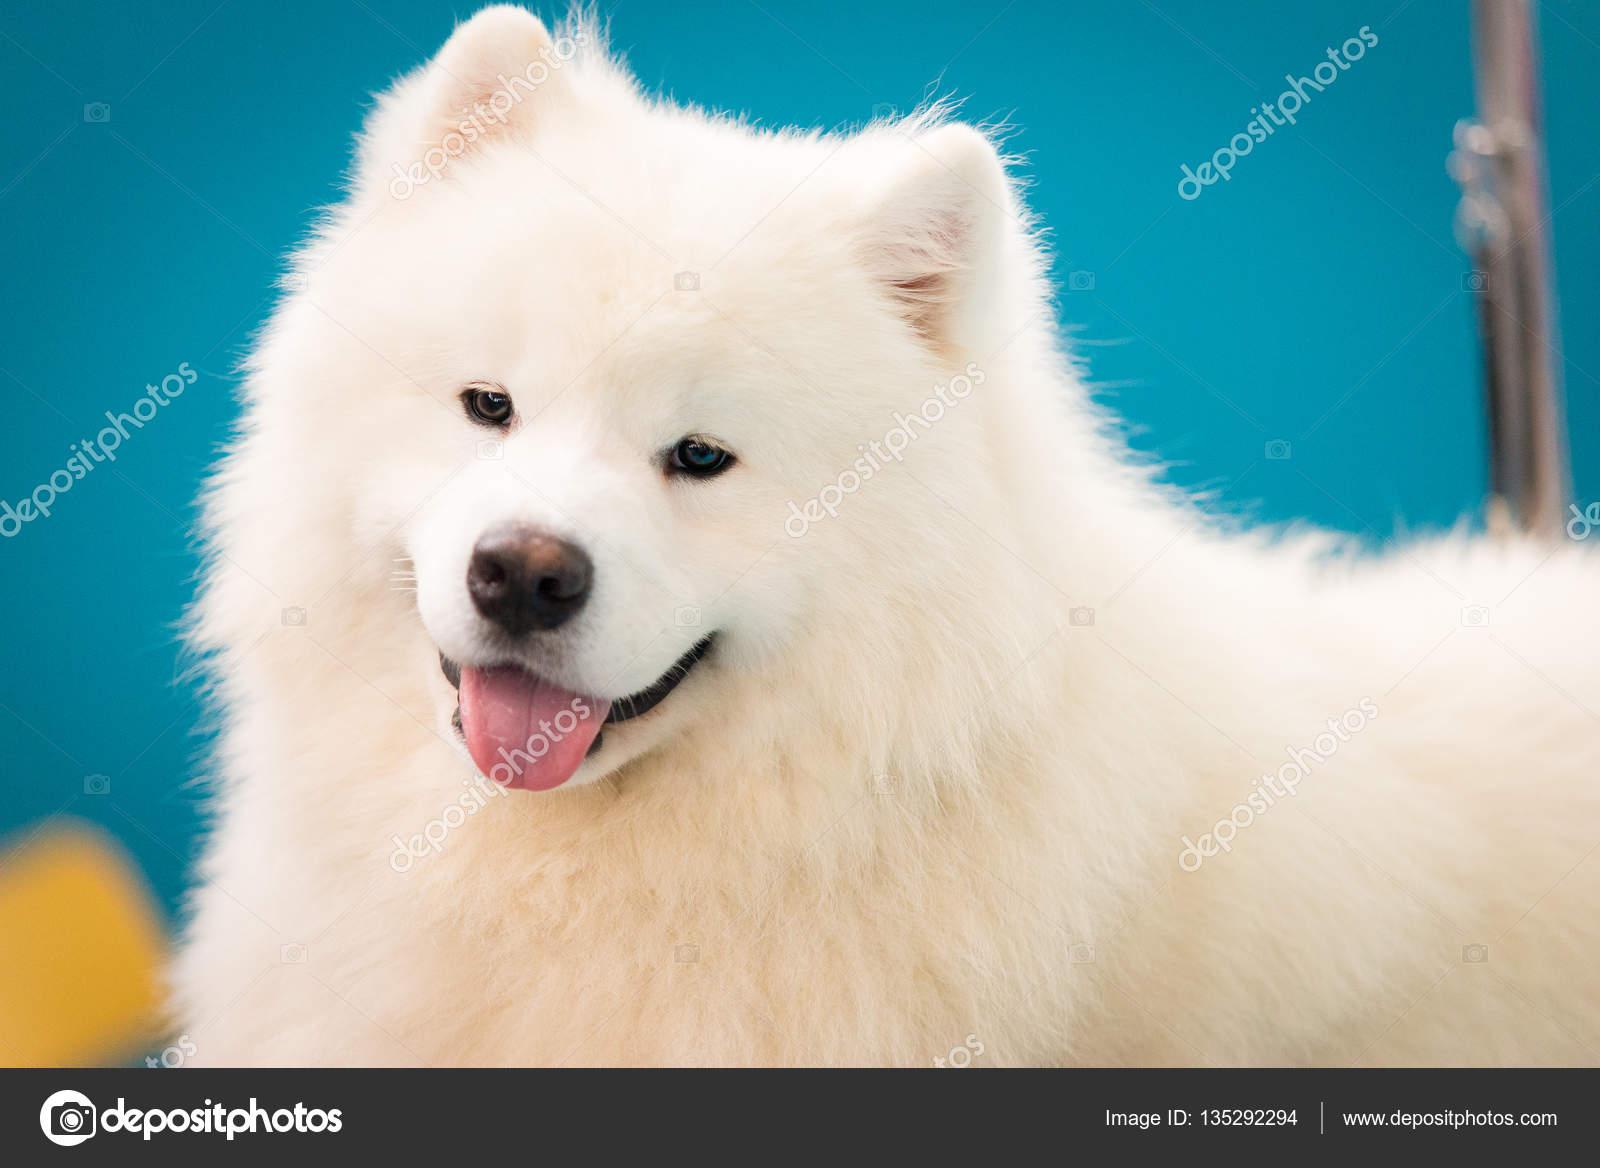 Portrait siberian samoyed white husky dog stock photo fosters portrait siberian samoyed white husky dog stock photo 135292294 voltagebd Image collections